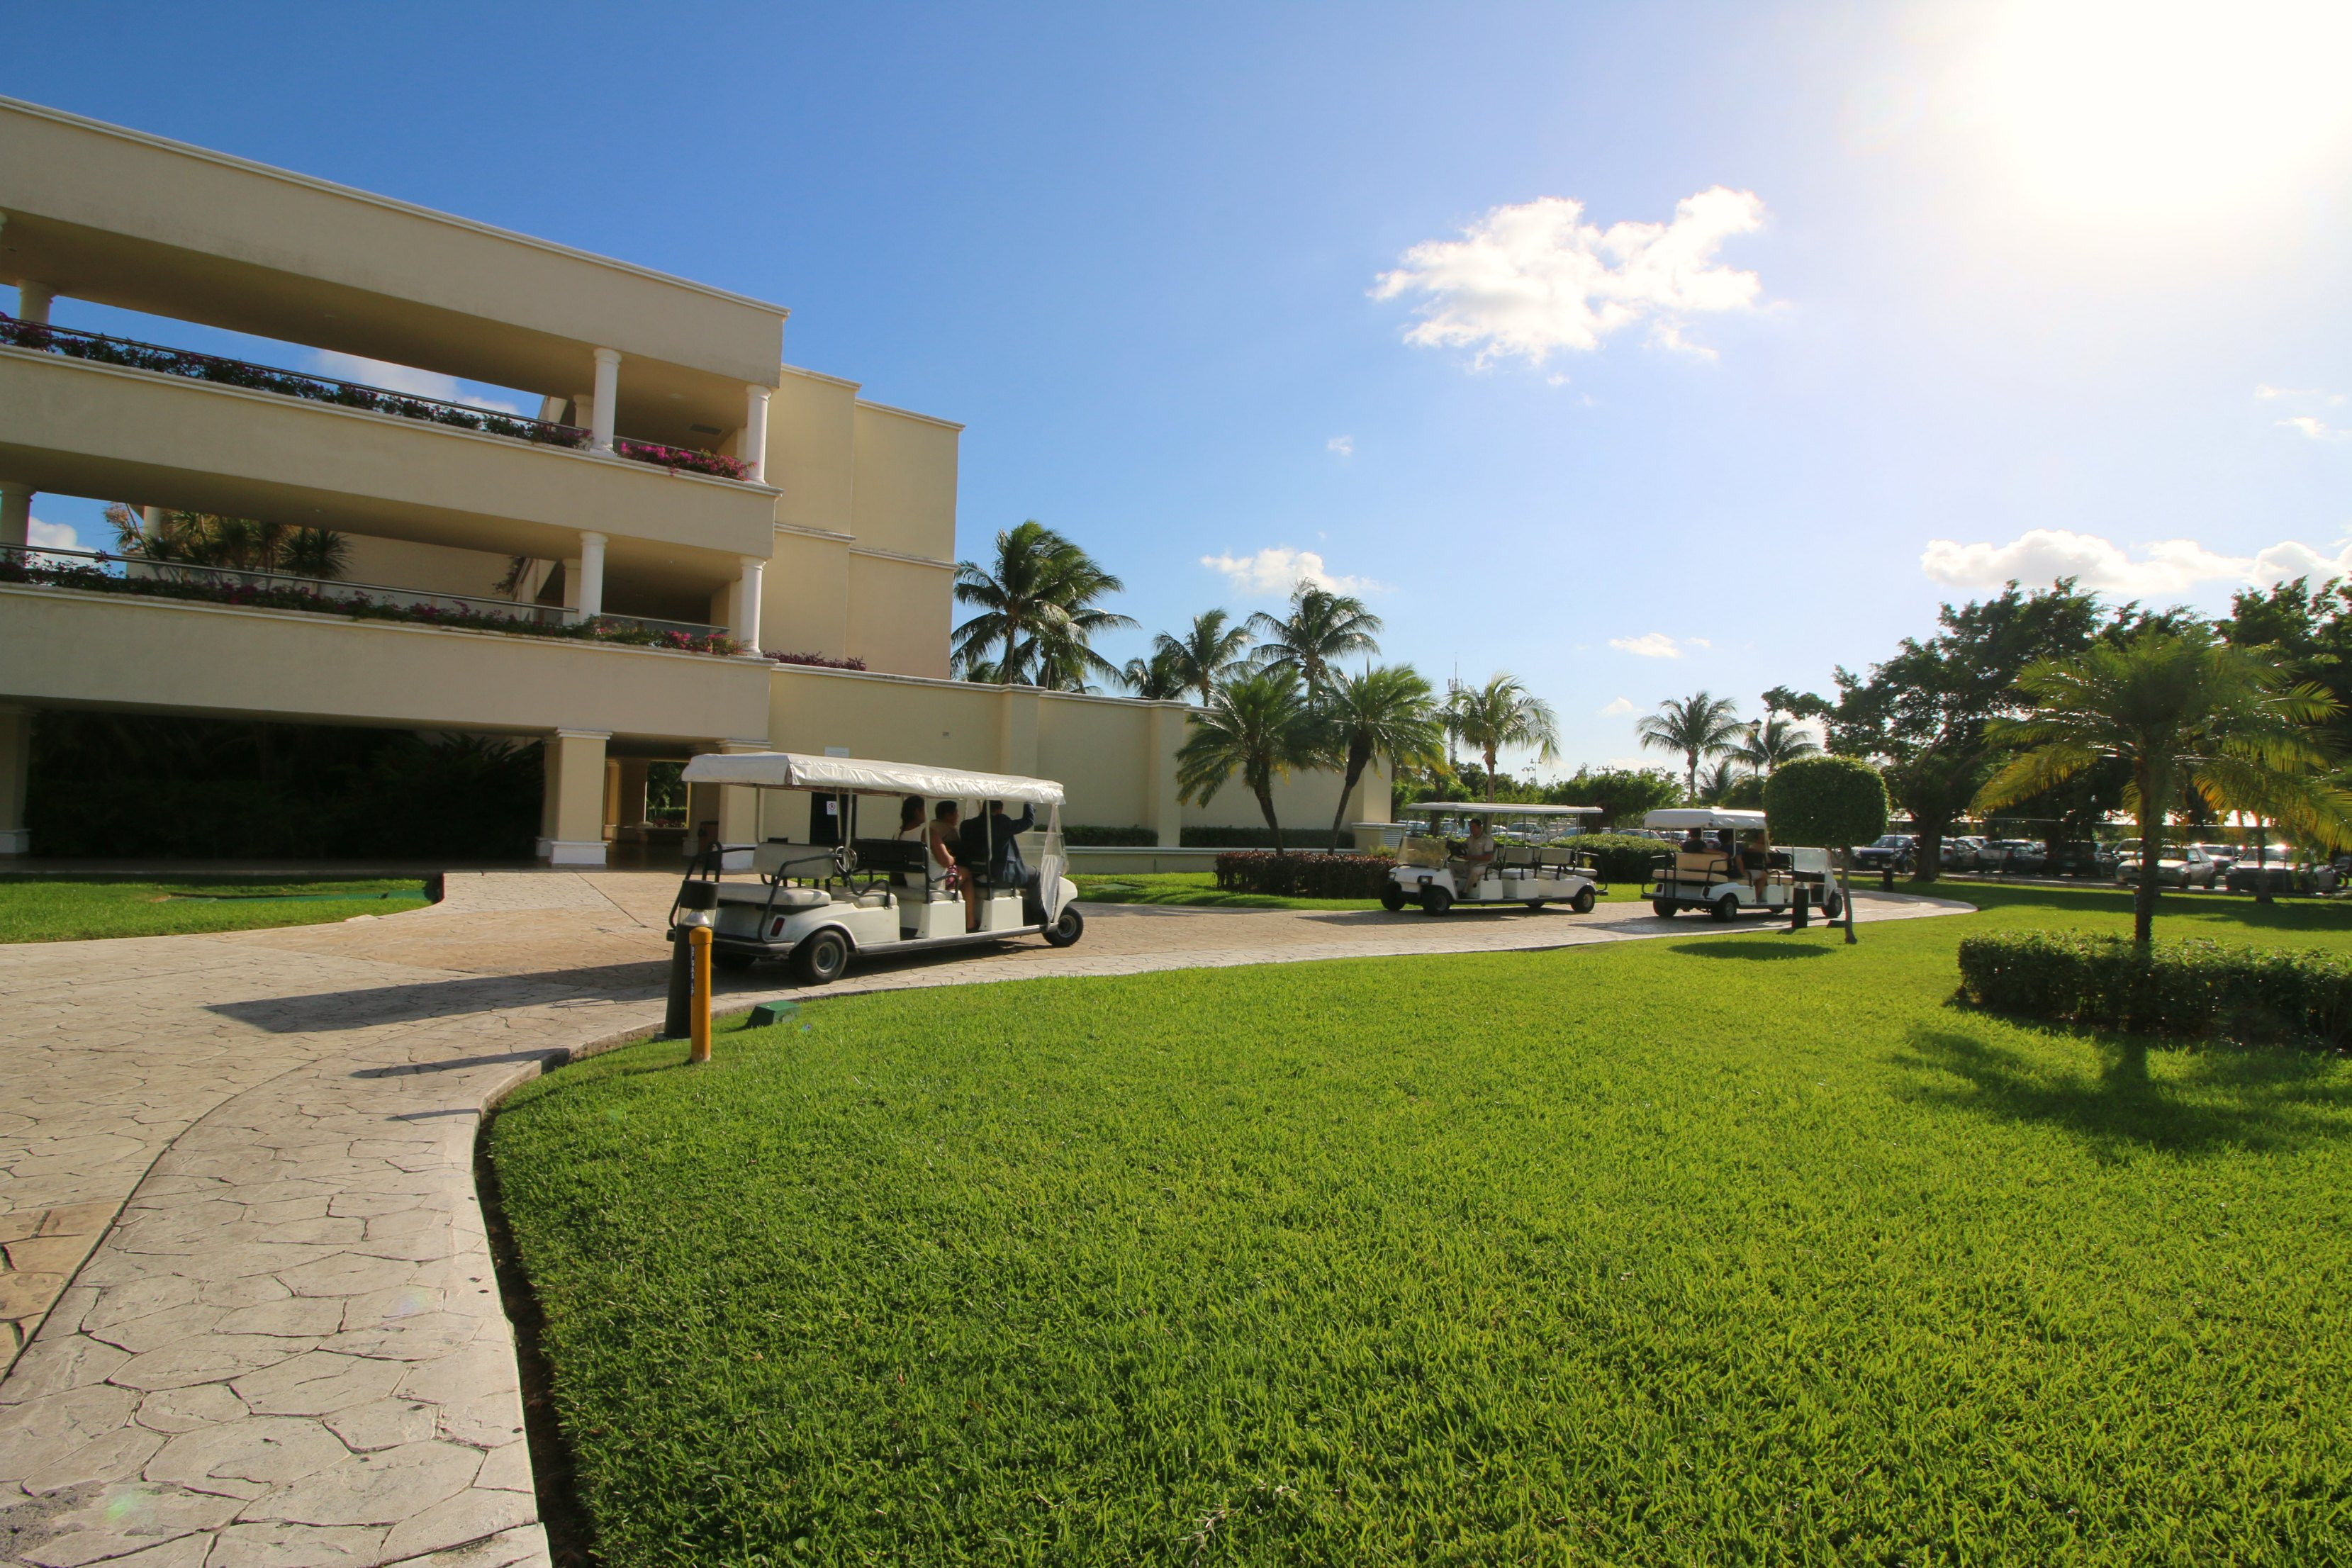 moon-palace-cancun-transportation-between-resorts